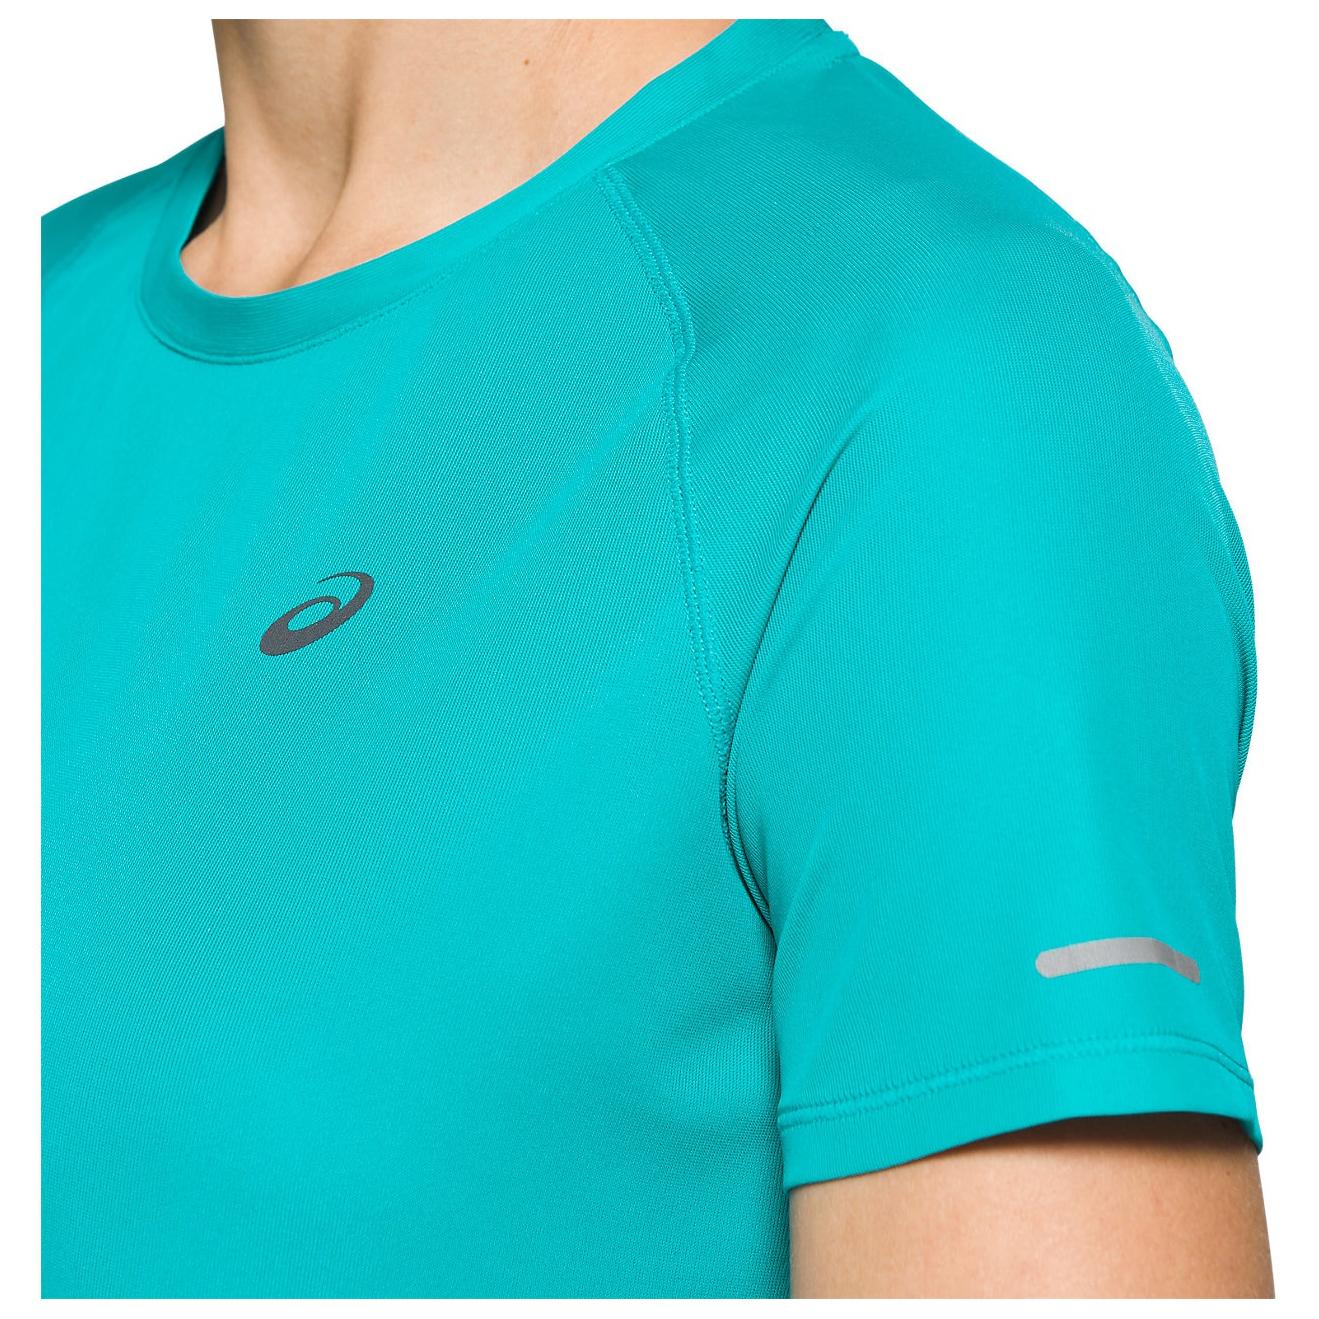 Asics - Women's Ventilate S/S Top - Running shirt - Lagoon   XS